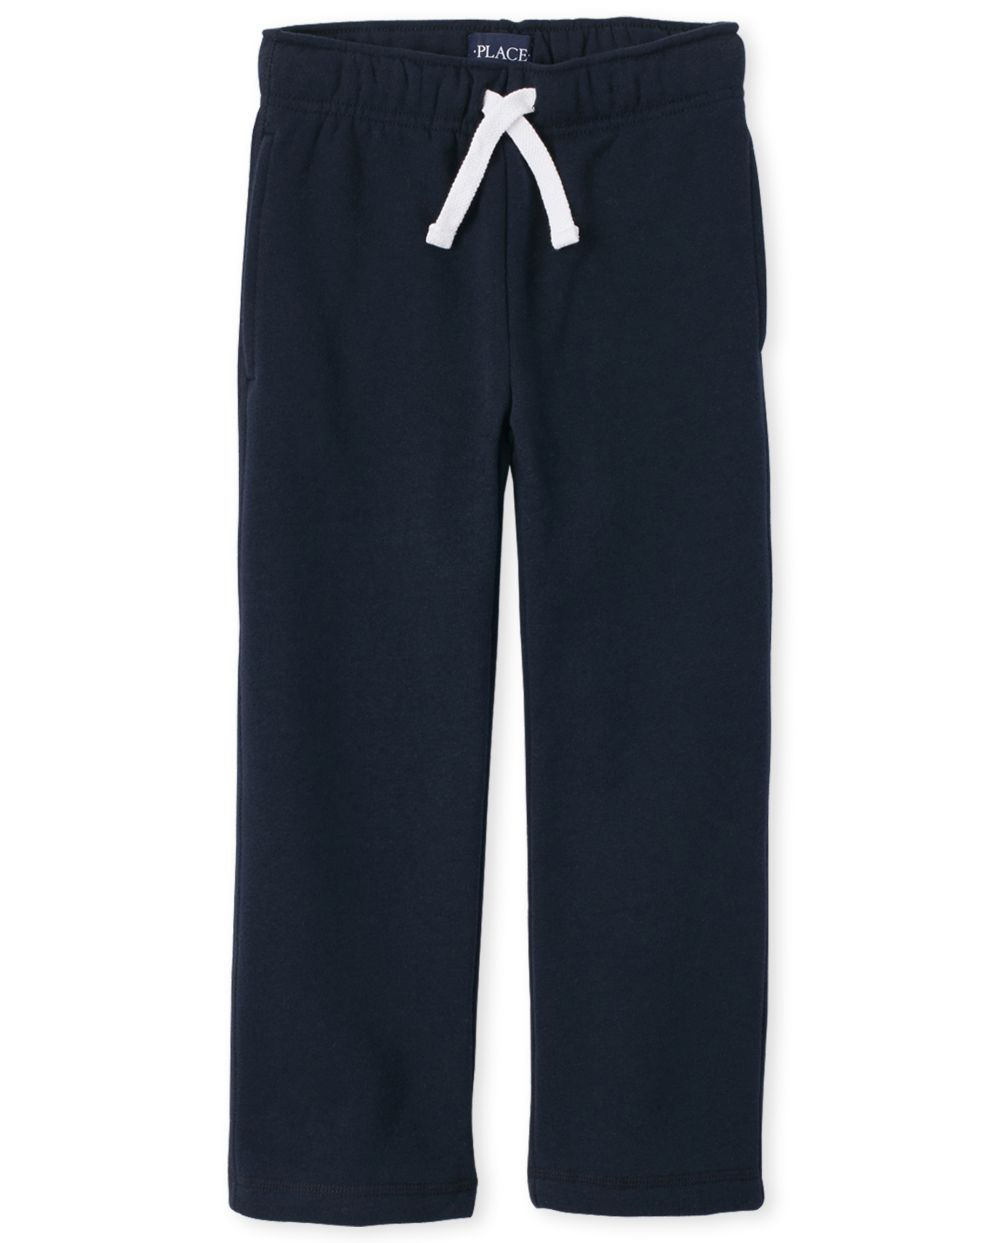 Boys Uniform Active Fleece Pants